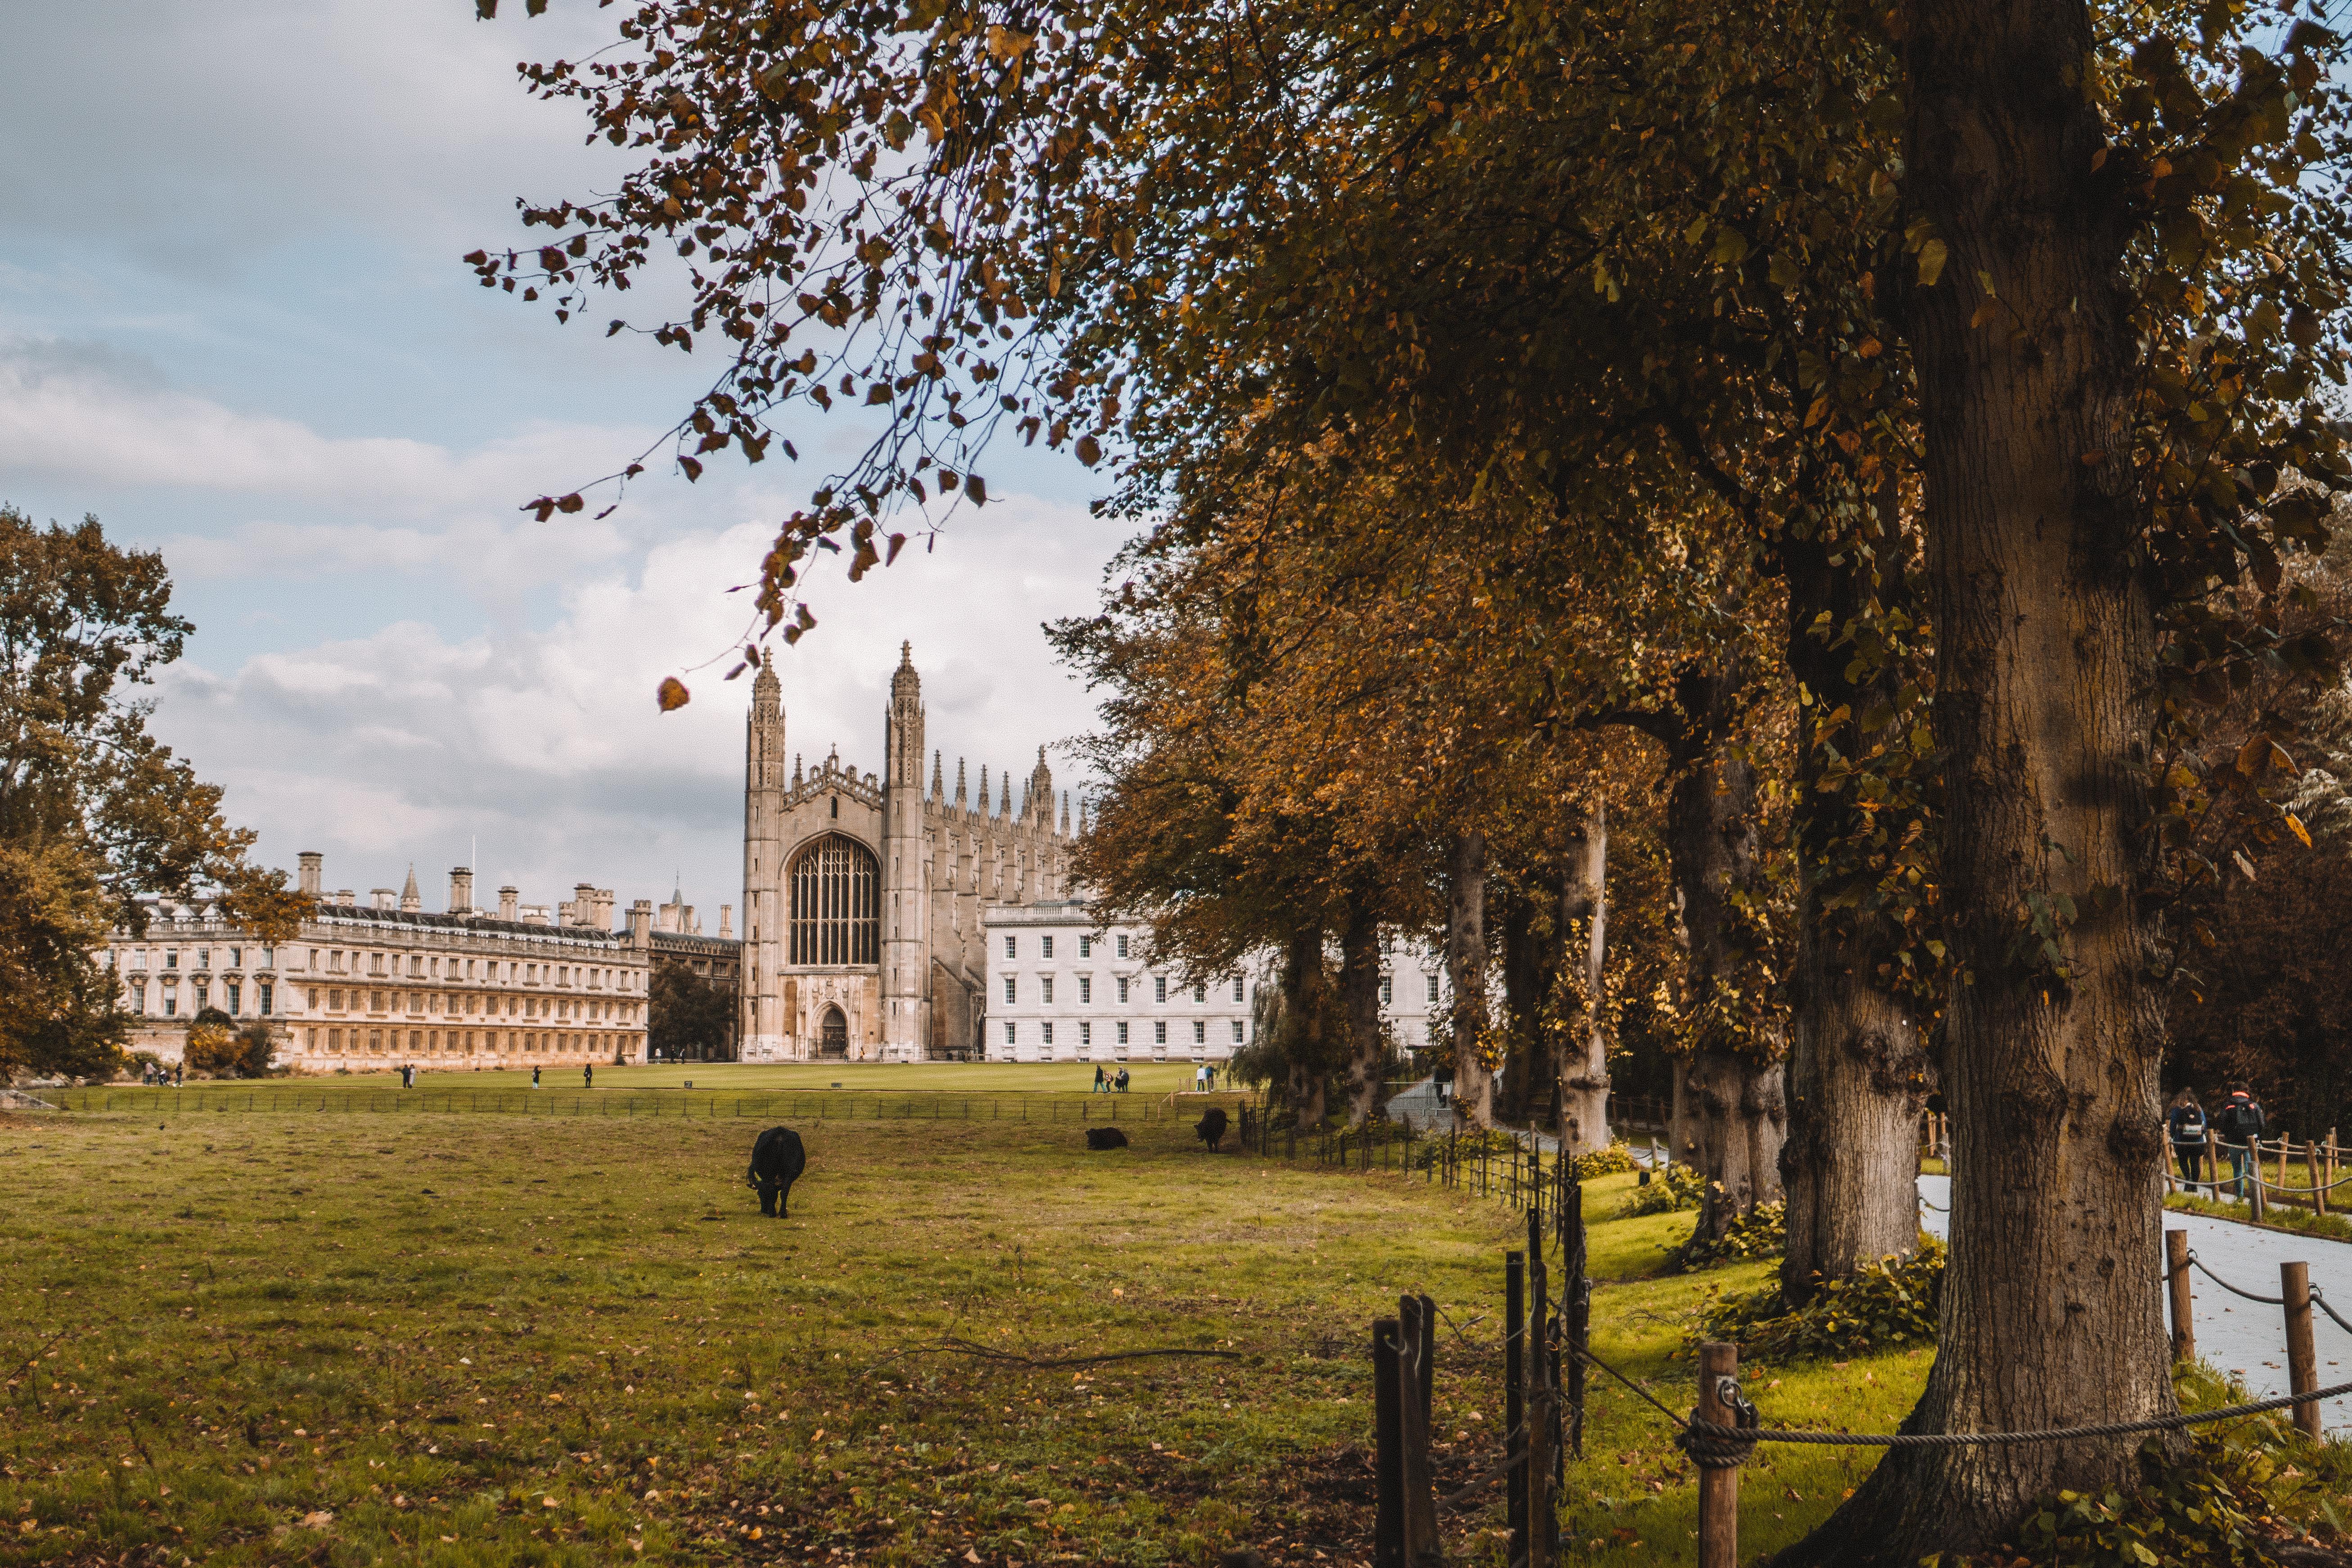 Kings College Cambridge in Autumn